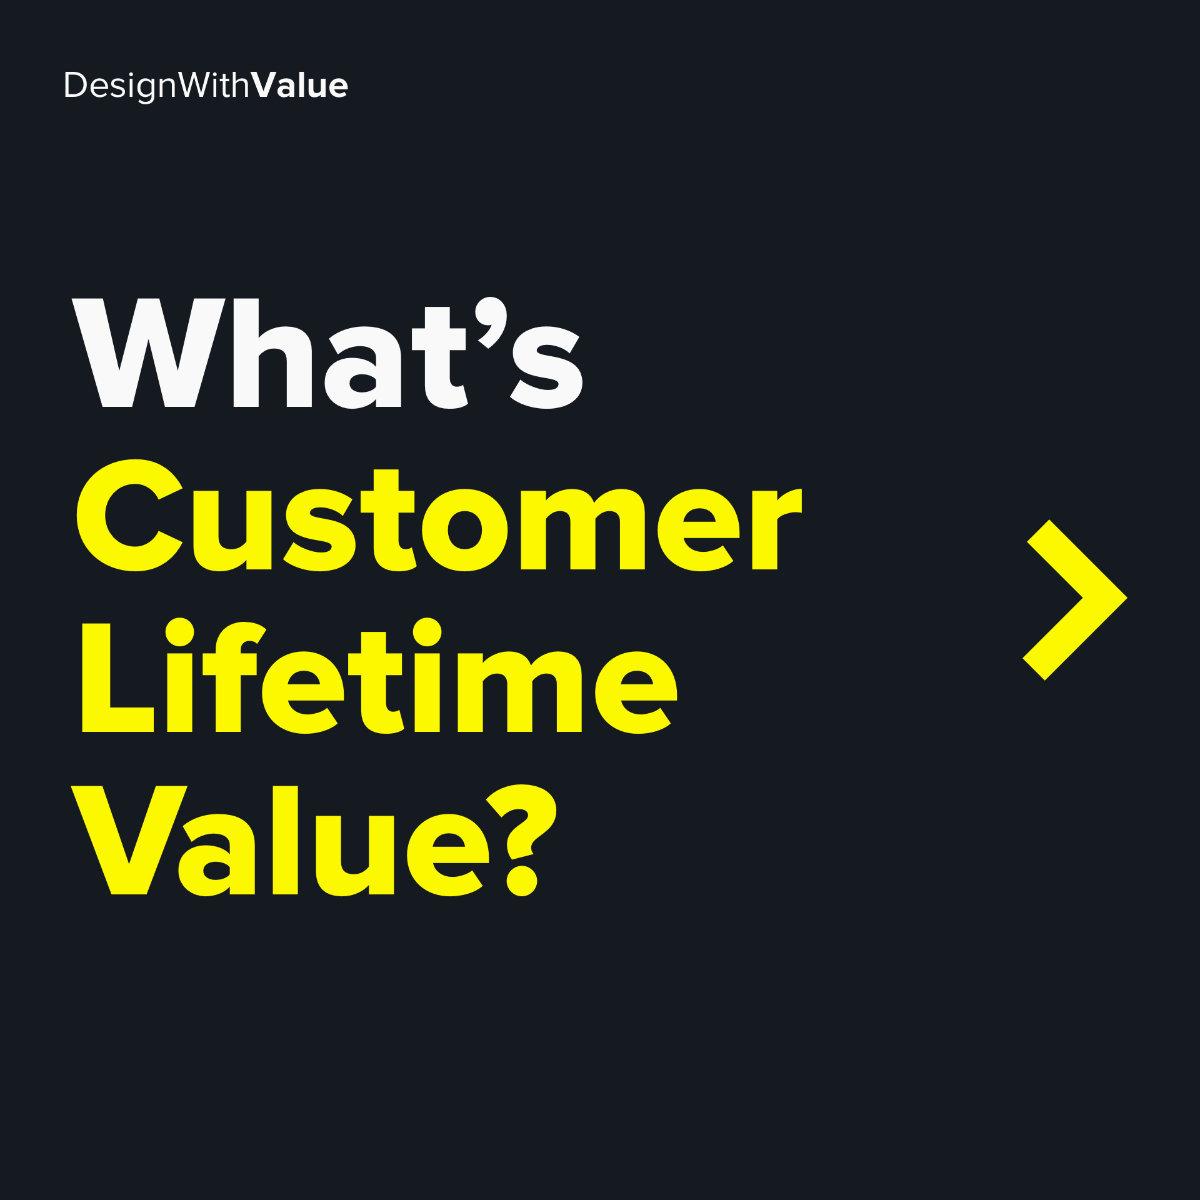 What's customer lifetime value?